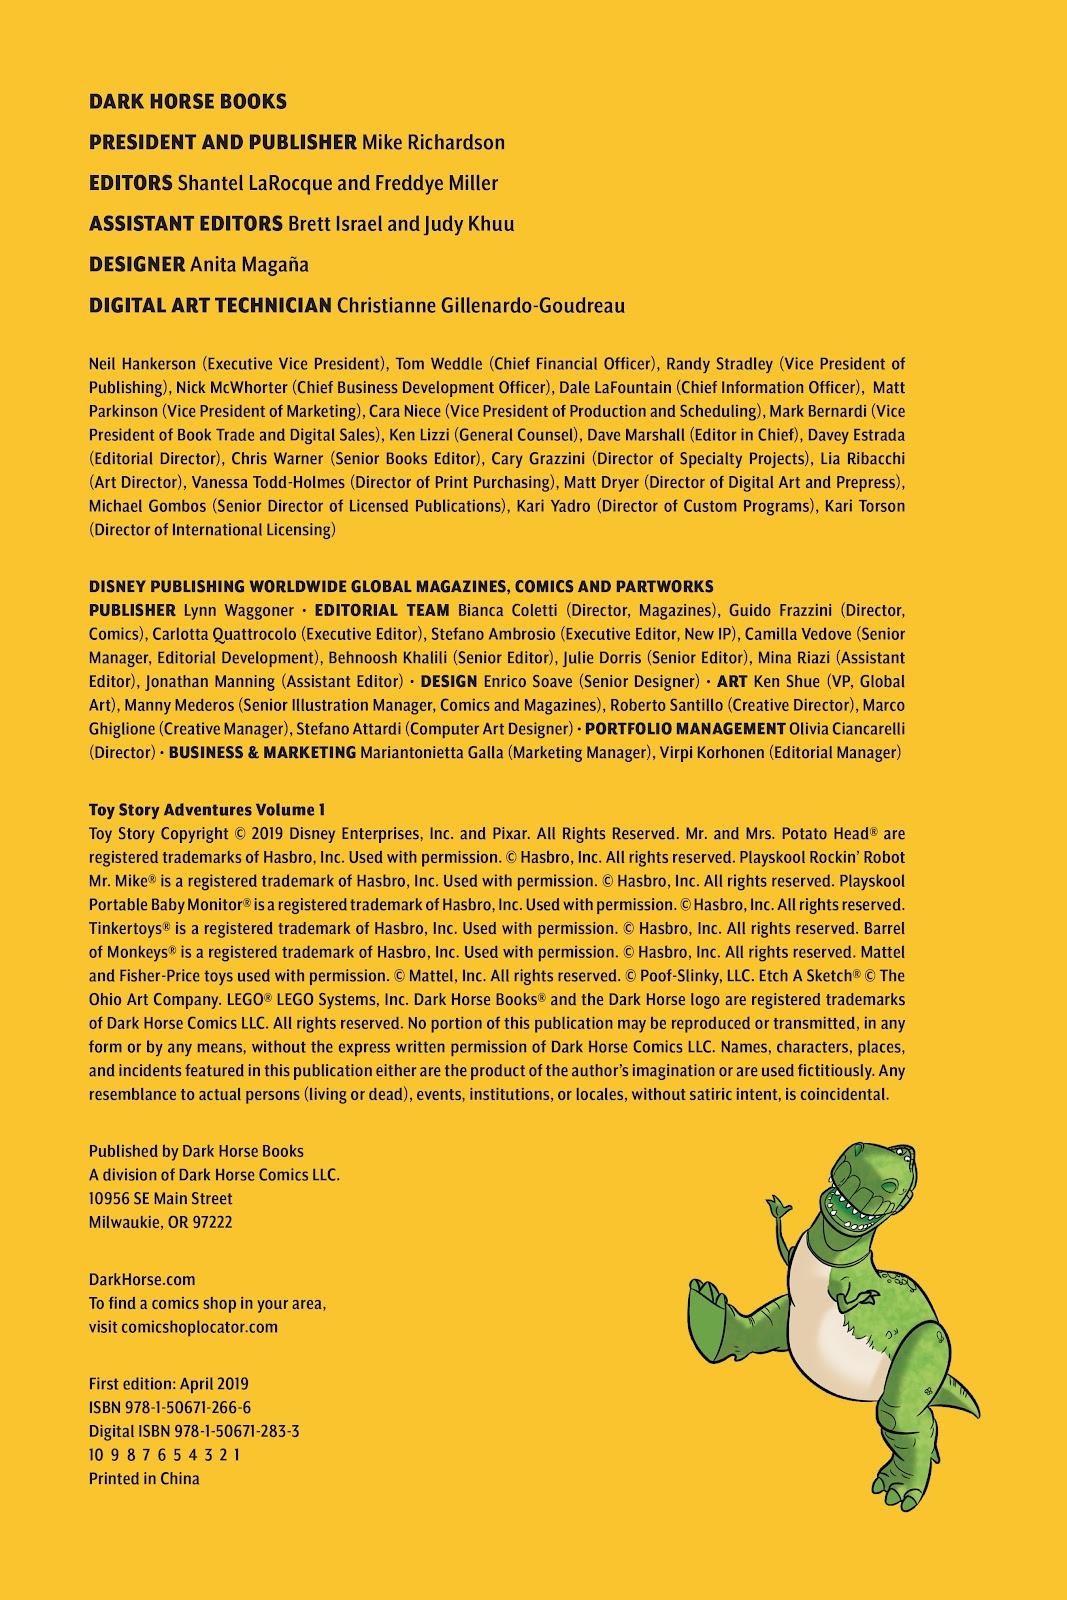 Read online DISNEY·PIXAR Toy Story Adventures comic -  Issue # TPB 1 (Part 1) - 4